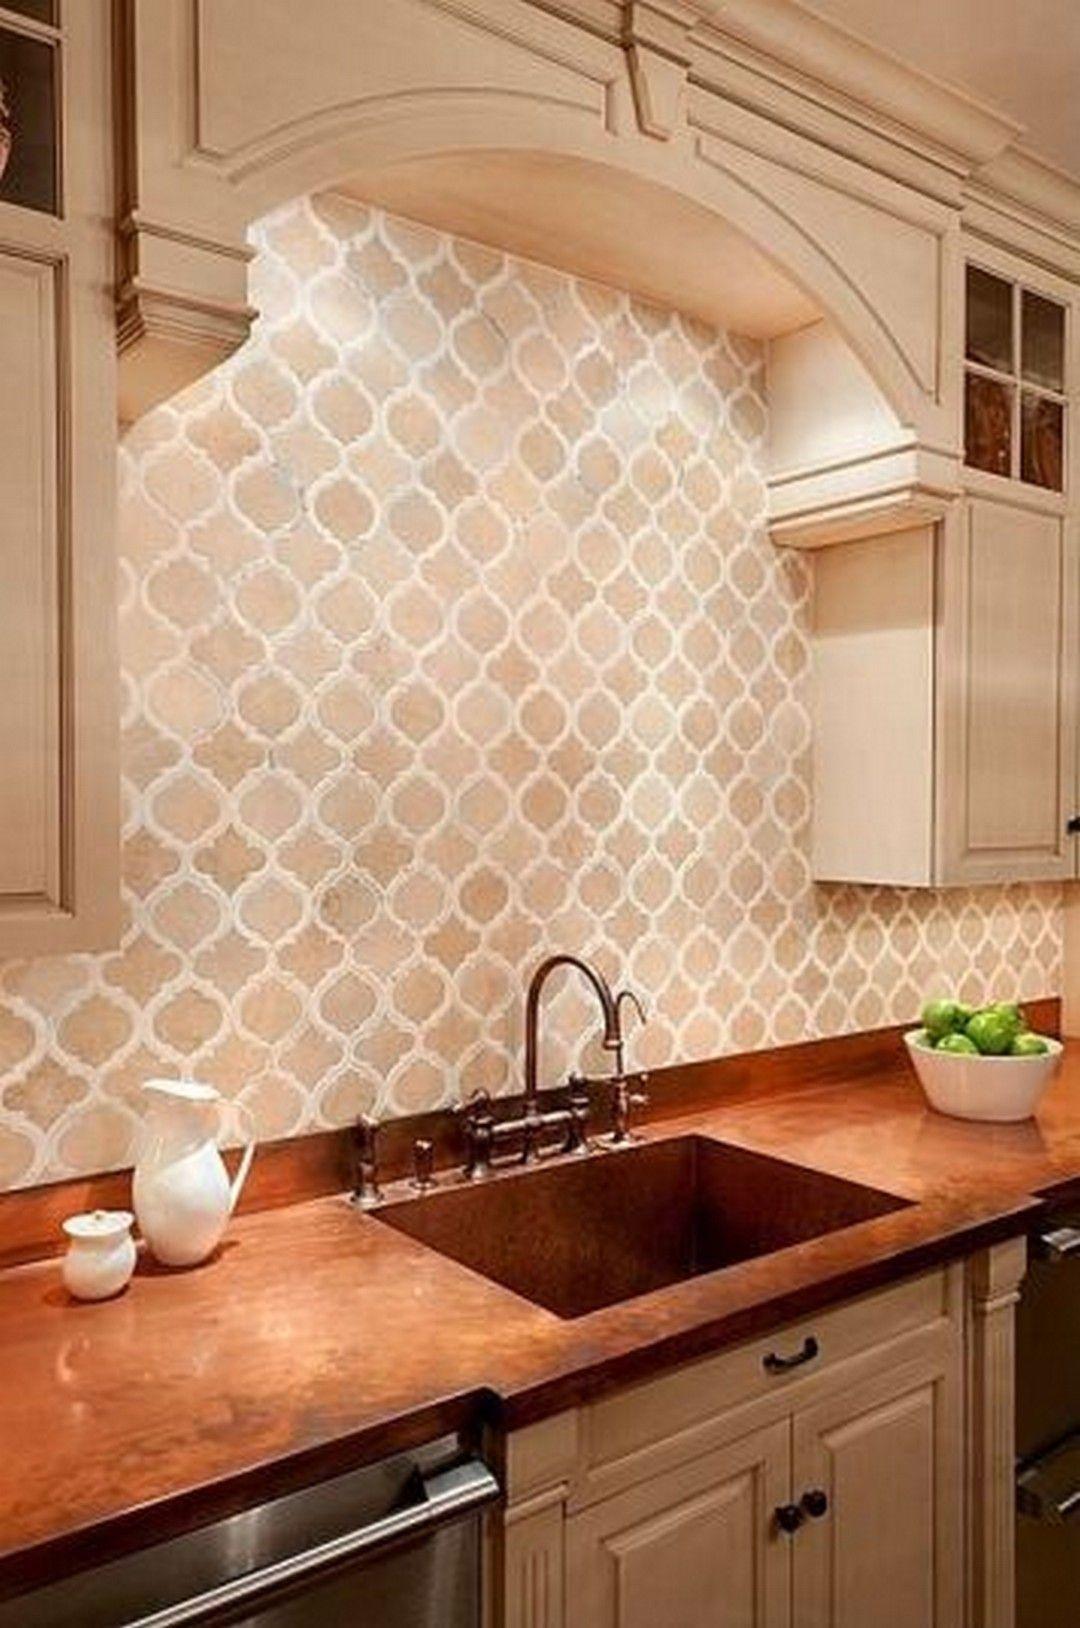 - Creative Neutral Kitchen Backsplash Ideas Neutral Backsplash